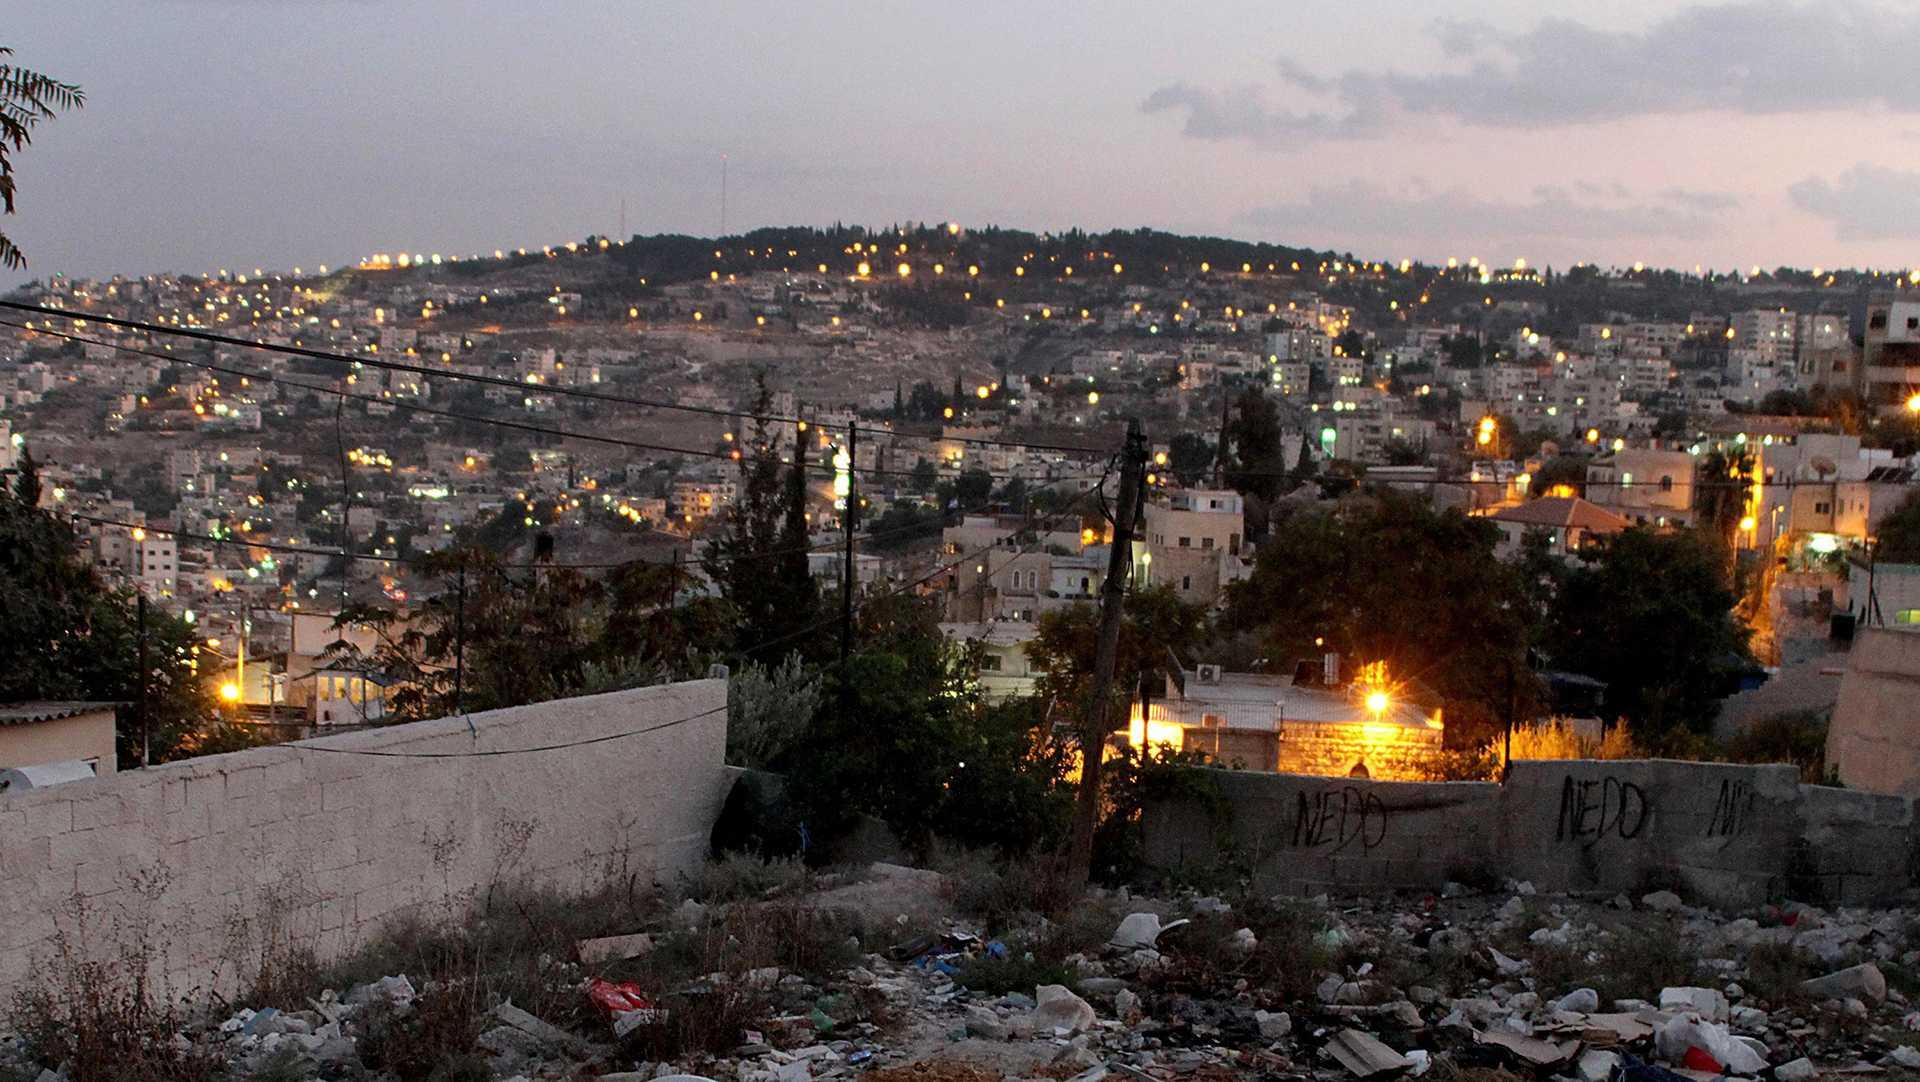 A general view of Silwan in East Jerusalem, on Wednesday, Oct. 1, 2014. (Quique Kierszenbaum/MCT)